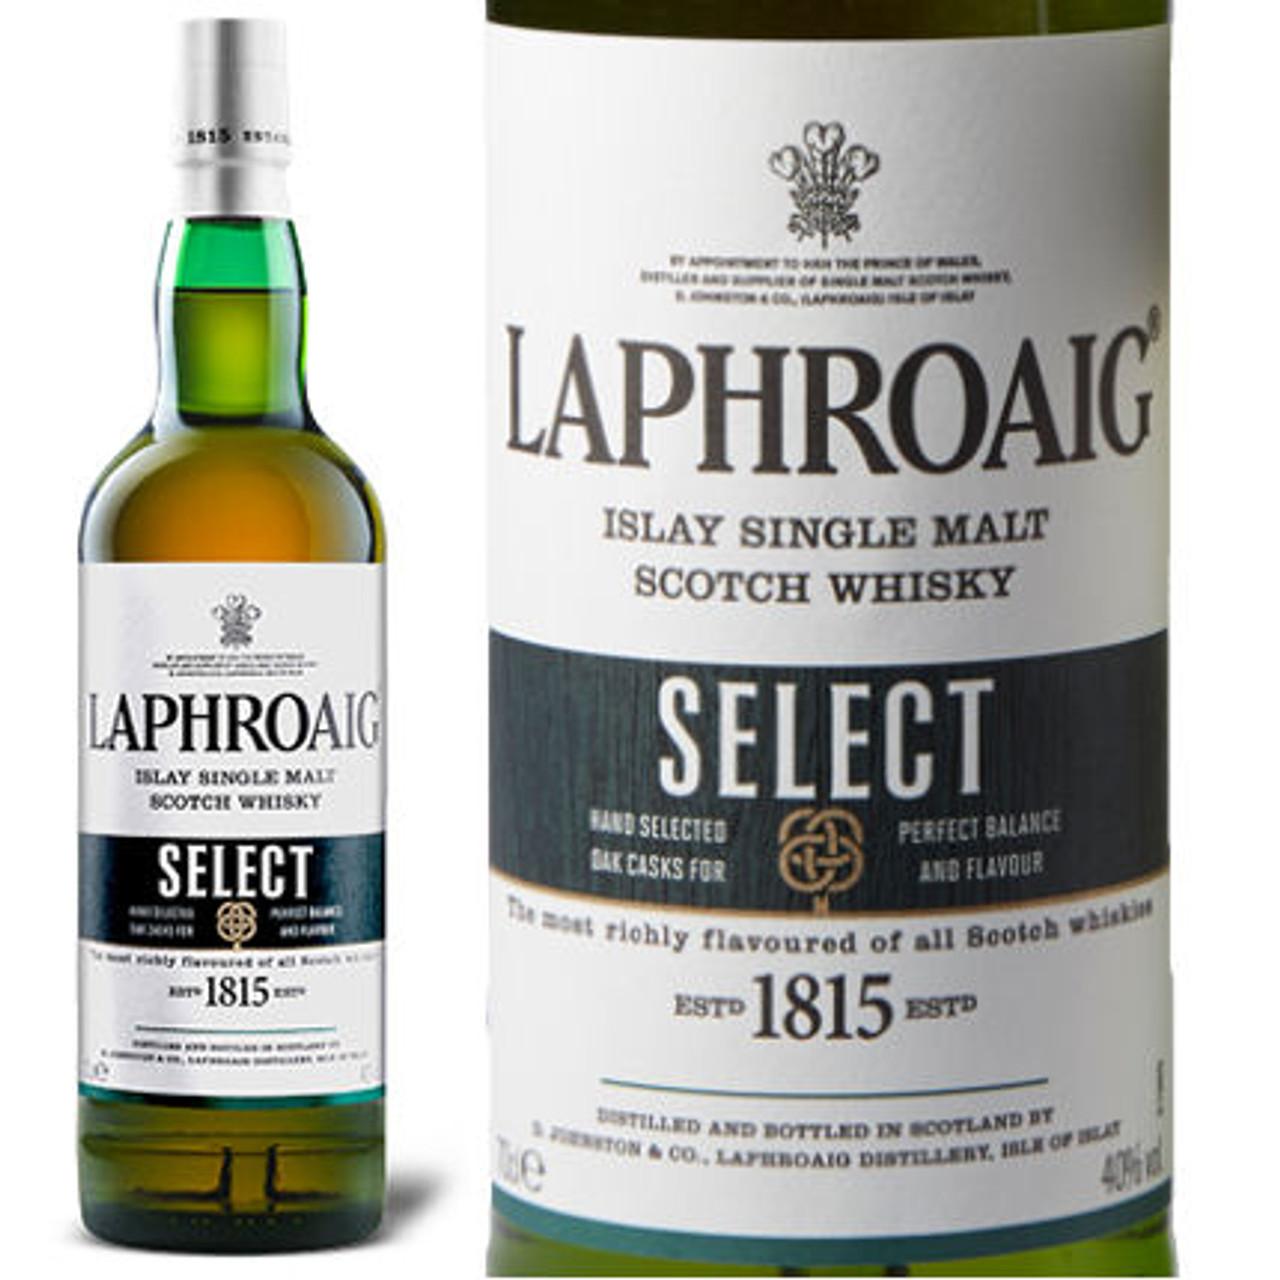 Laphroaig Select Islay Single Malt Scotch 750ml